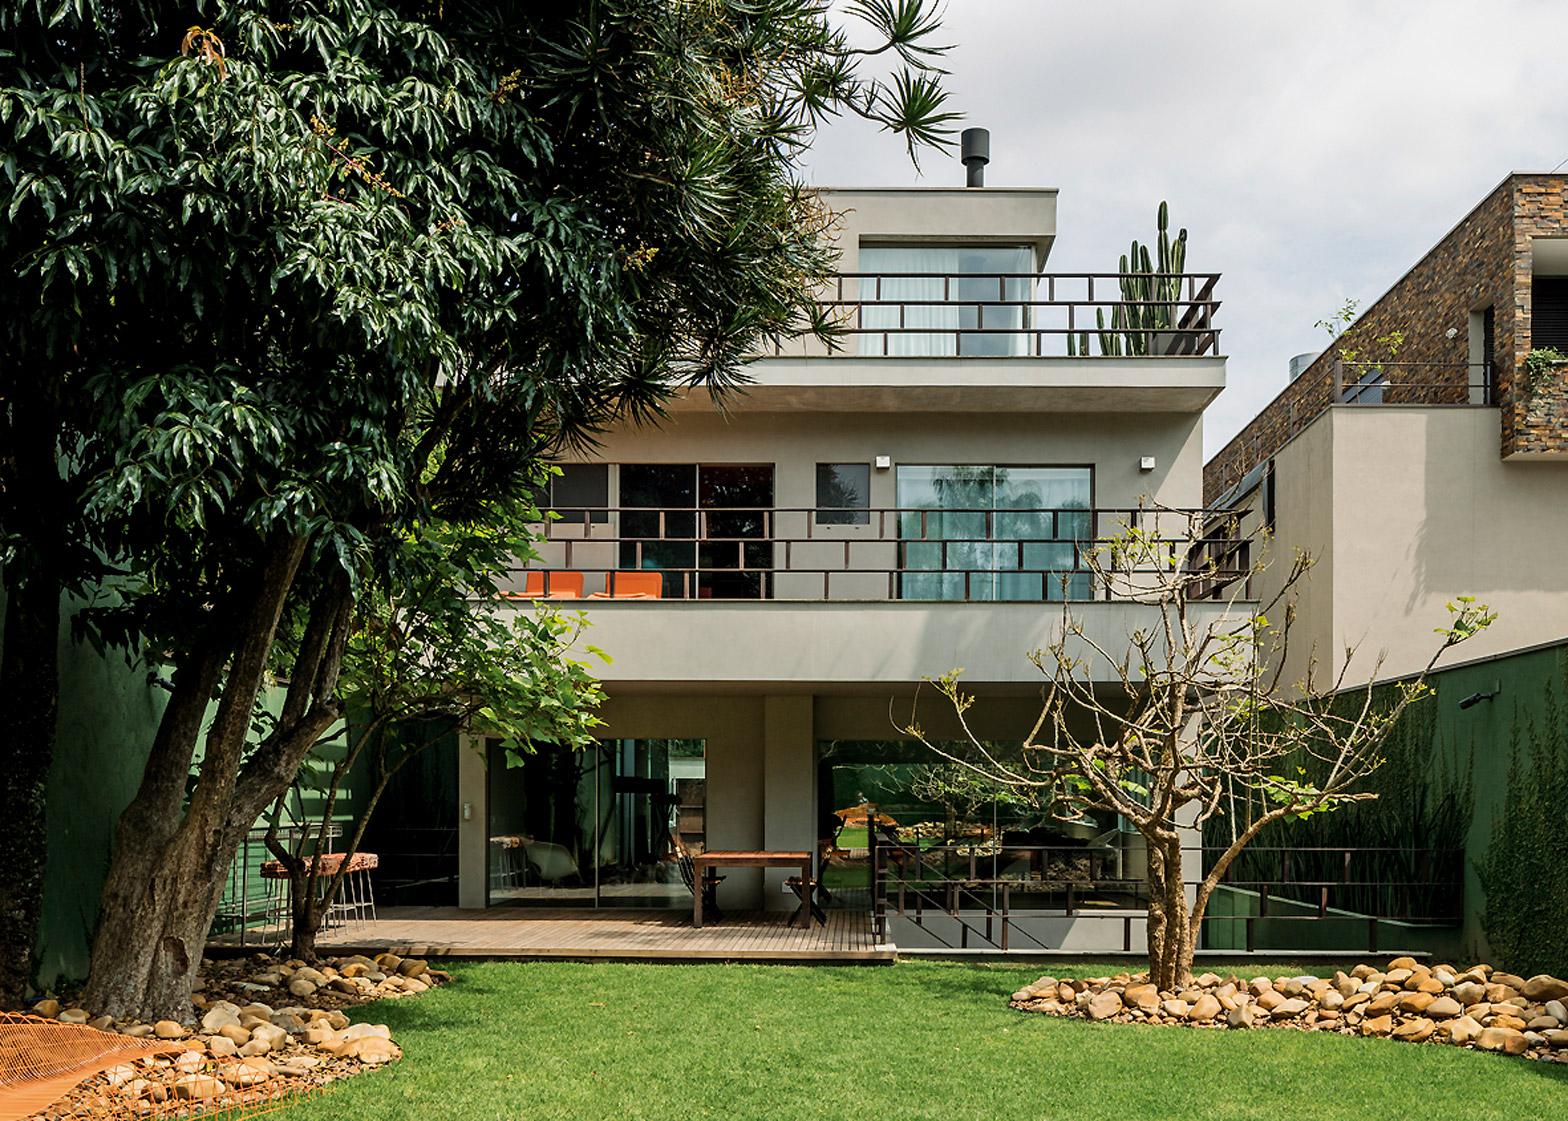 private-house-studio-campanas-sao-paulo-designers-architecture-piassava-palm-fibre-facade-leonardo-finotti-photography_dezeen_1568_14.jpg